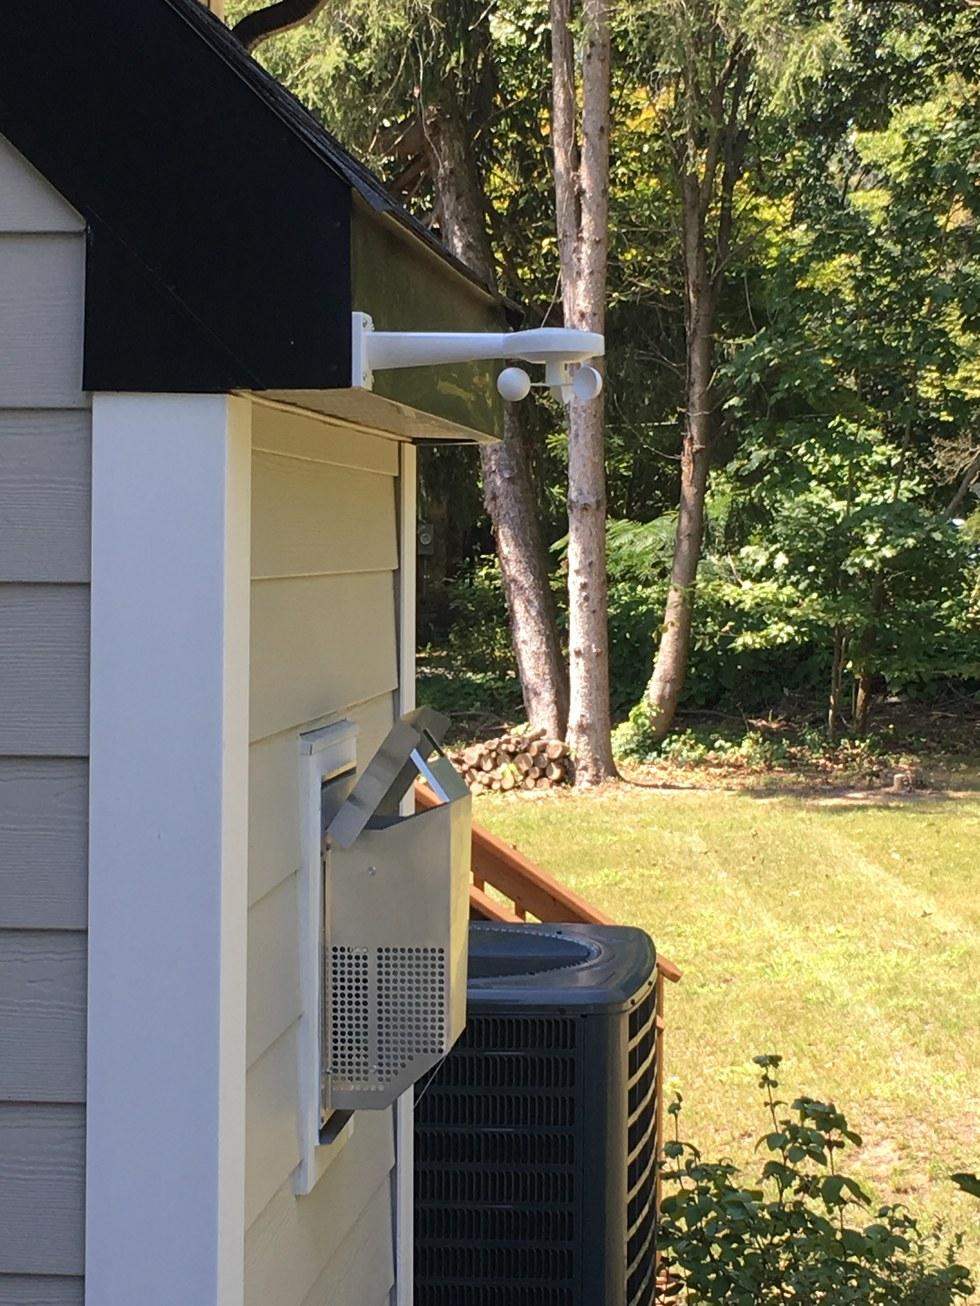 Loxone Wind Sensor & Weather Service